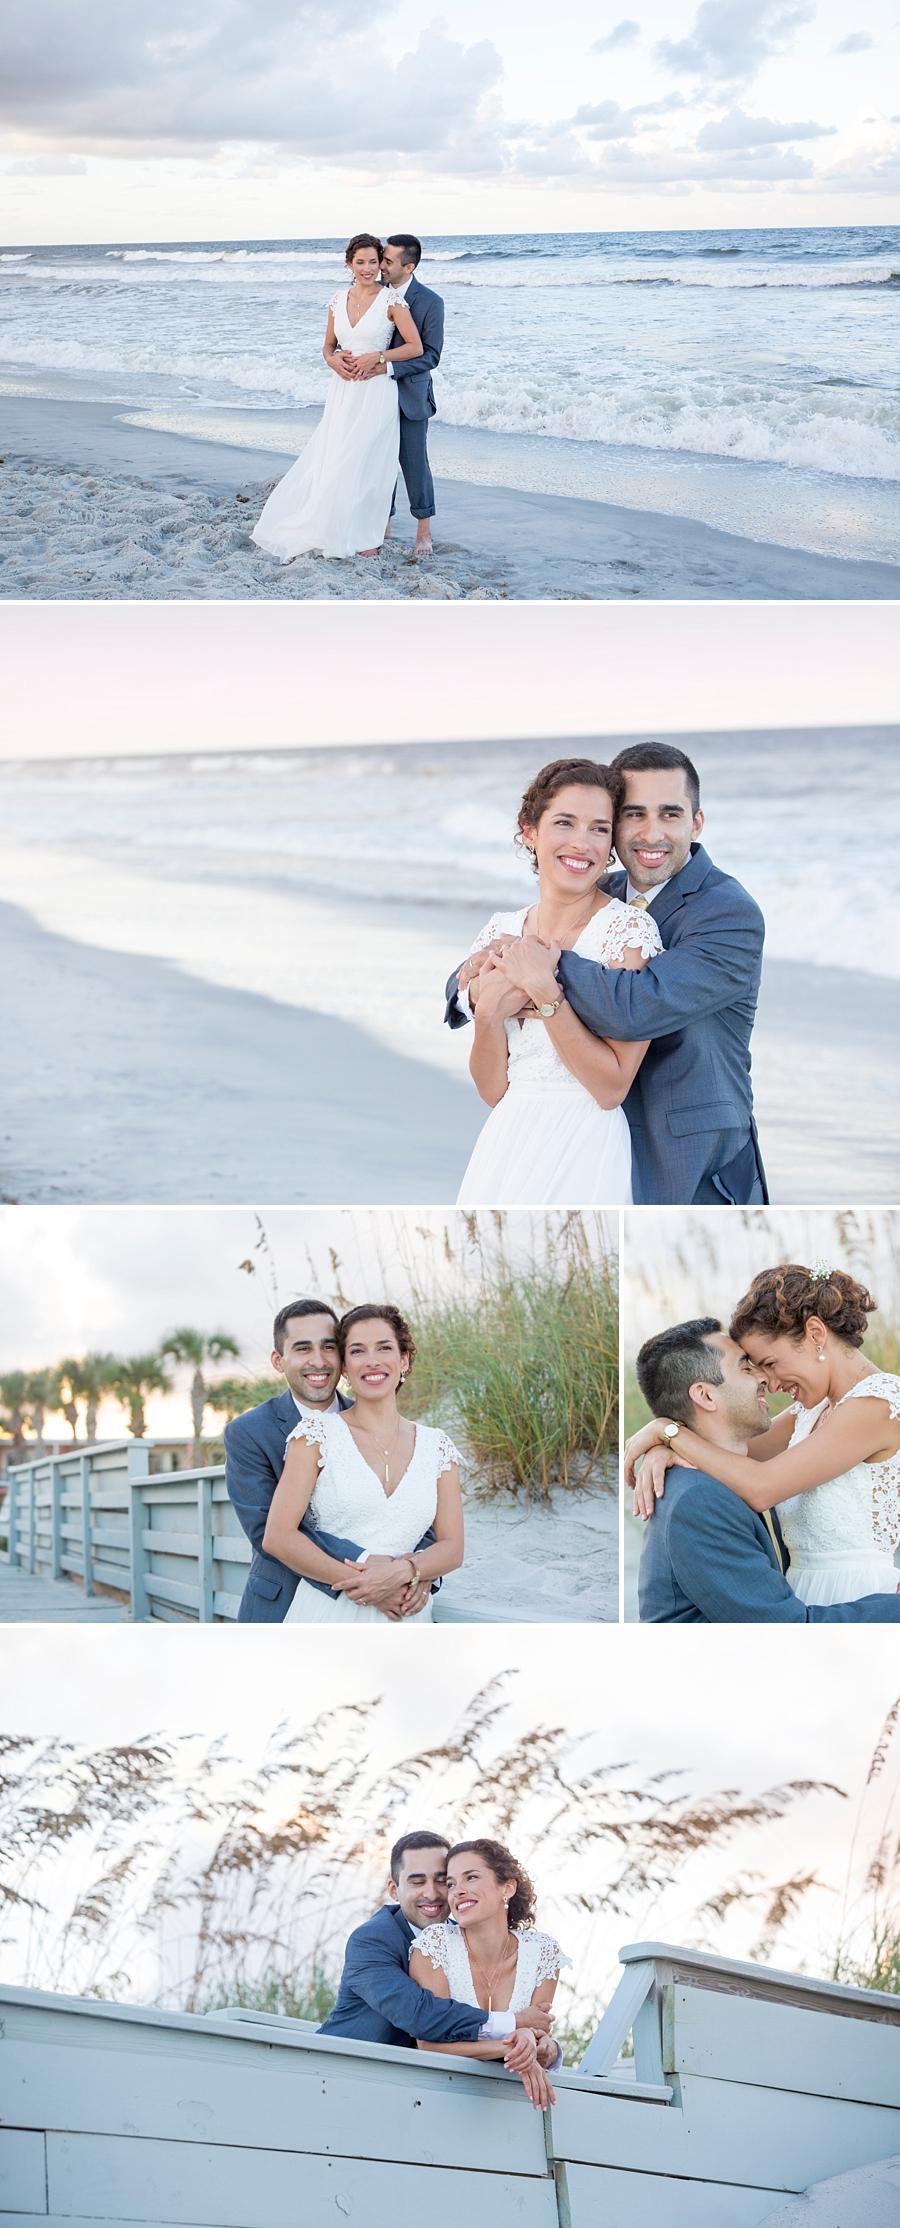 wedding beach photos in the sunset